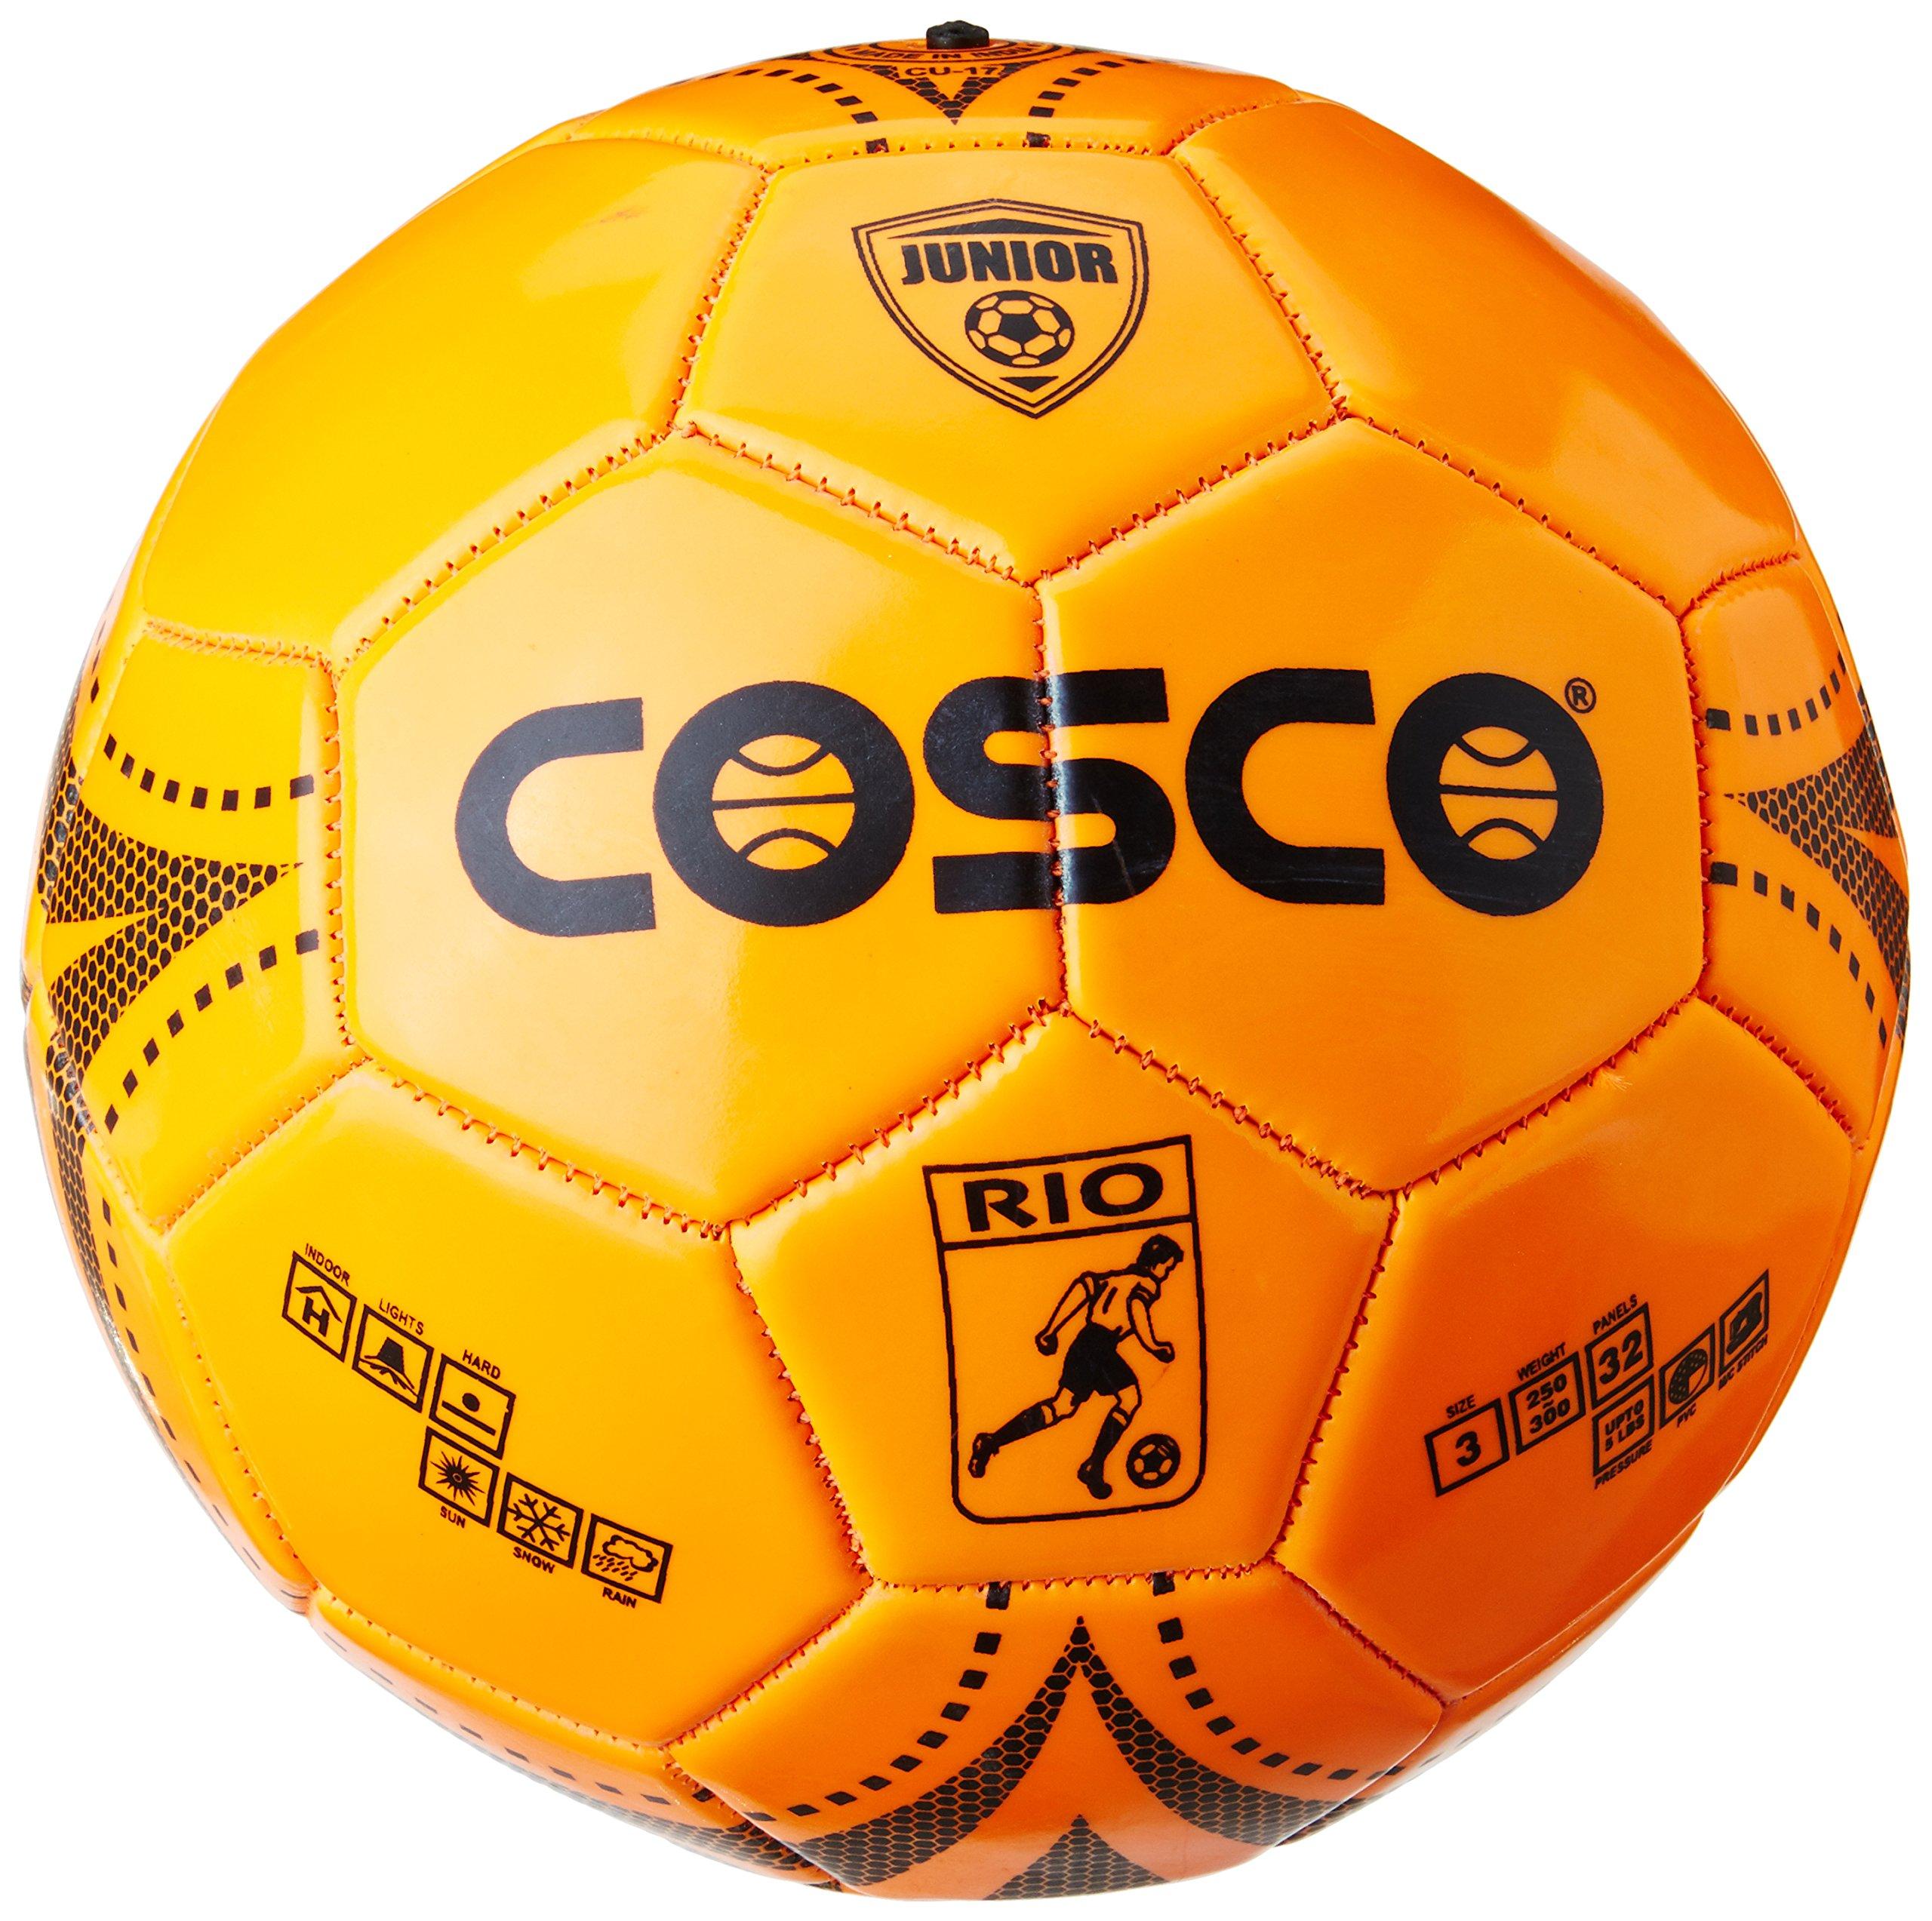 Cosco-Rio-Kids-Football-Size-3-Small-Sized-Football